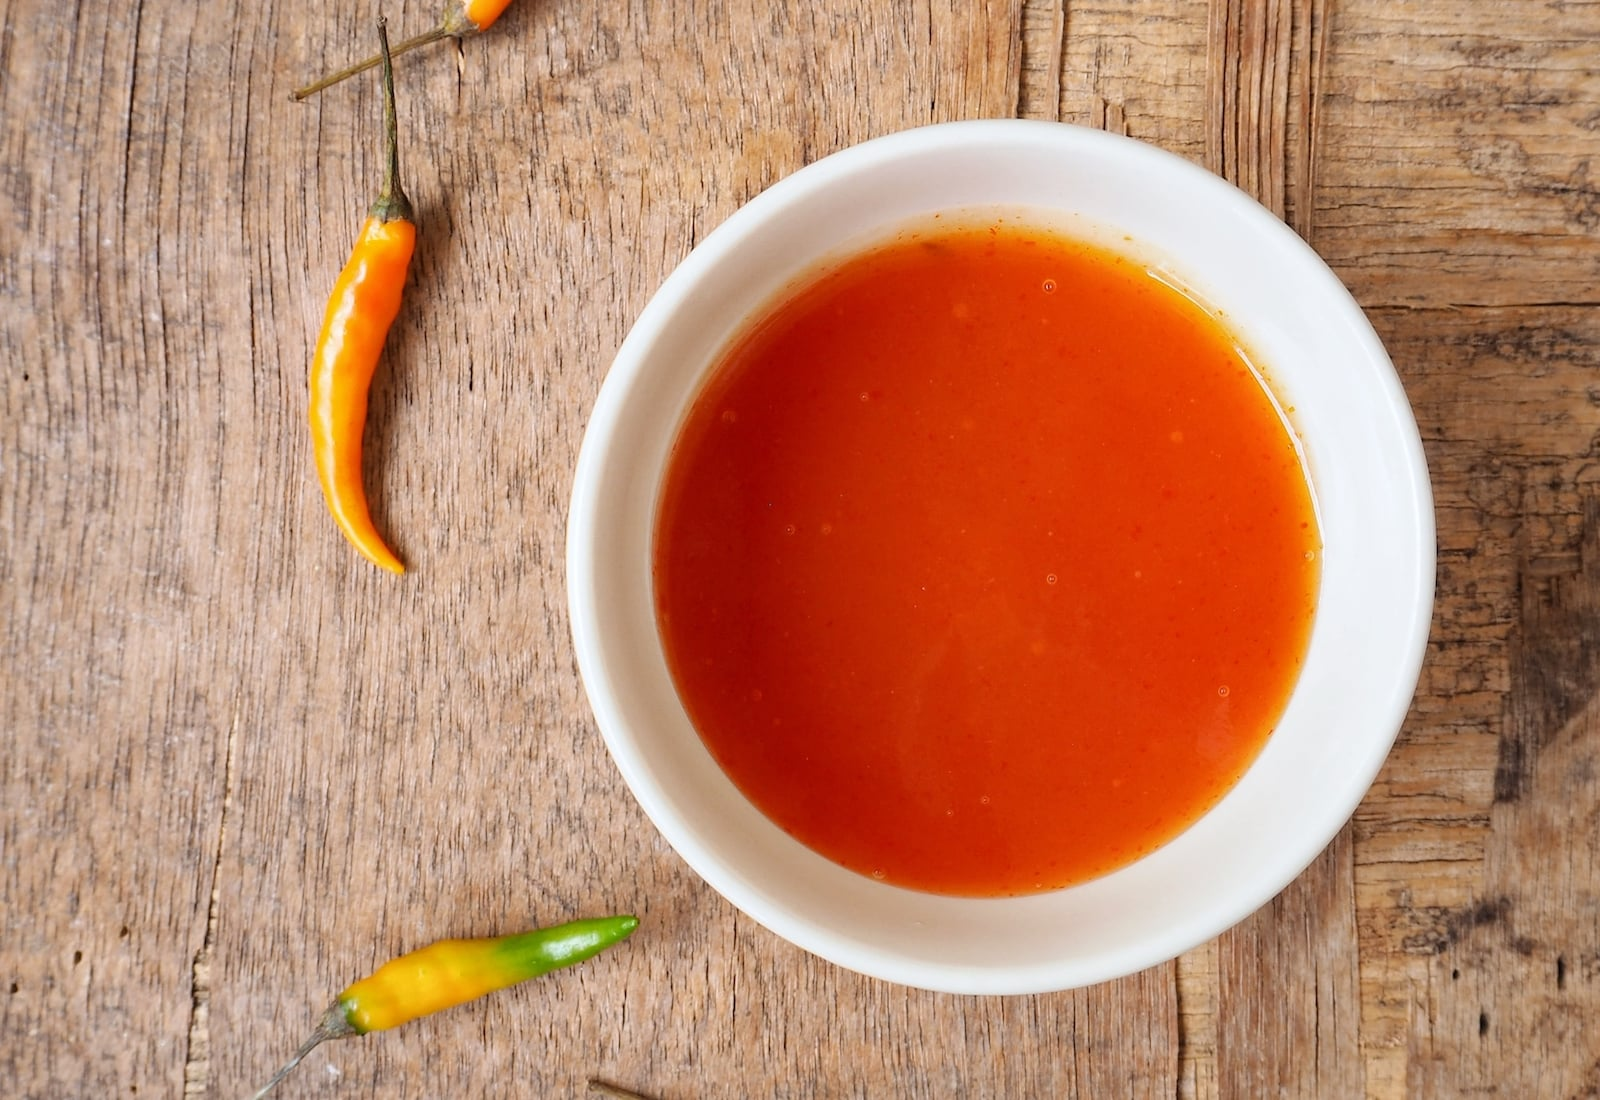 Seven Classic Sriracha Uses